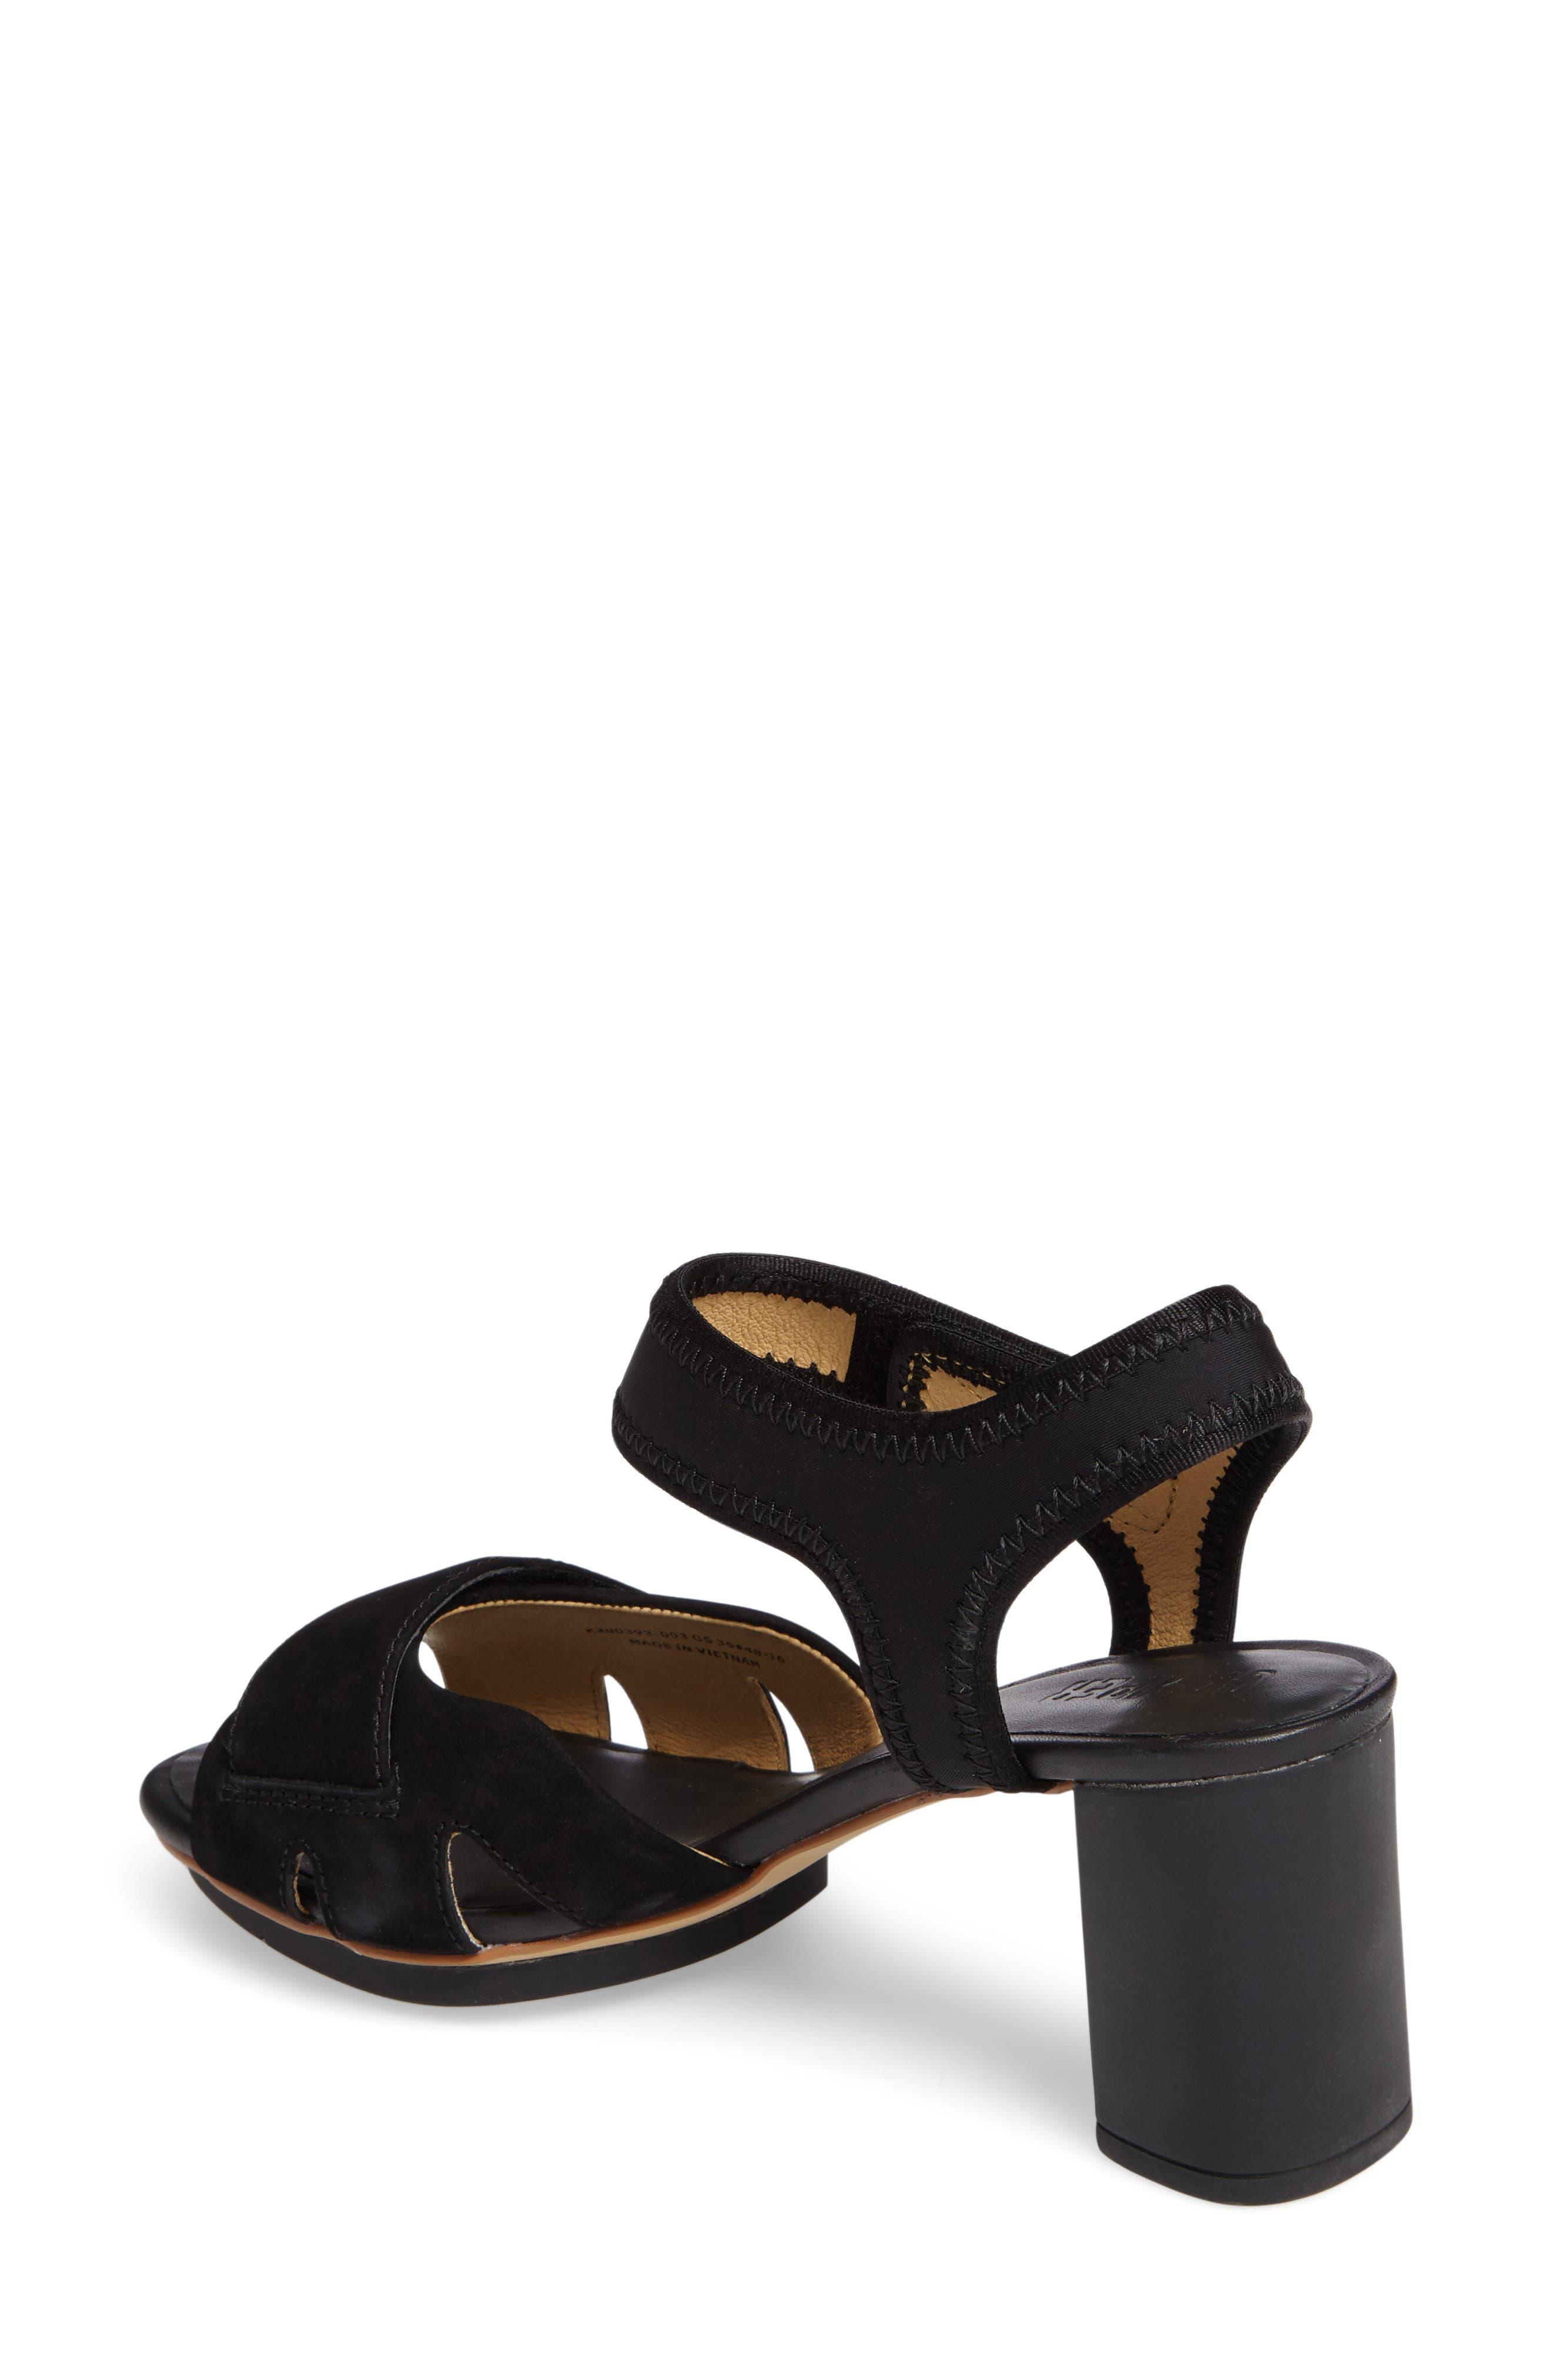 'Myriam' Ankle Strap Platform Sandal,                             Alternate thumbnail 2, color,                             Black/ Black Leather